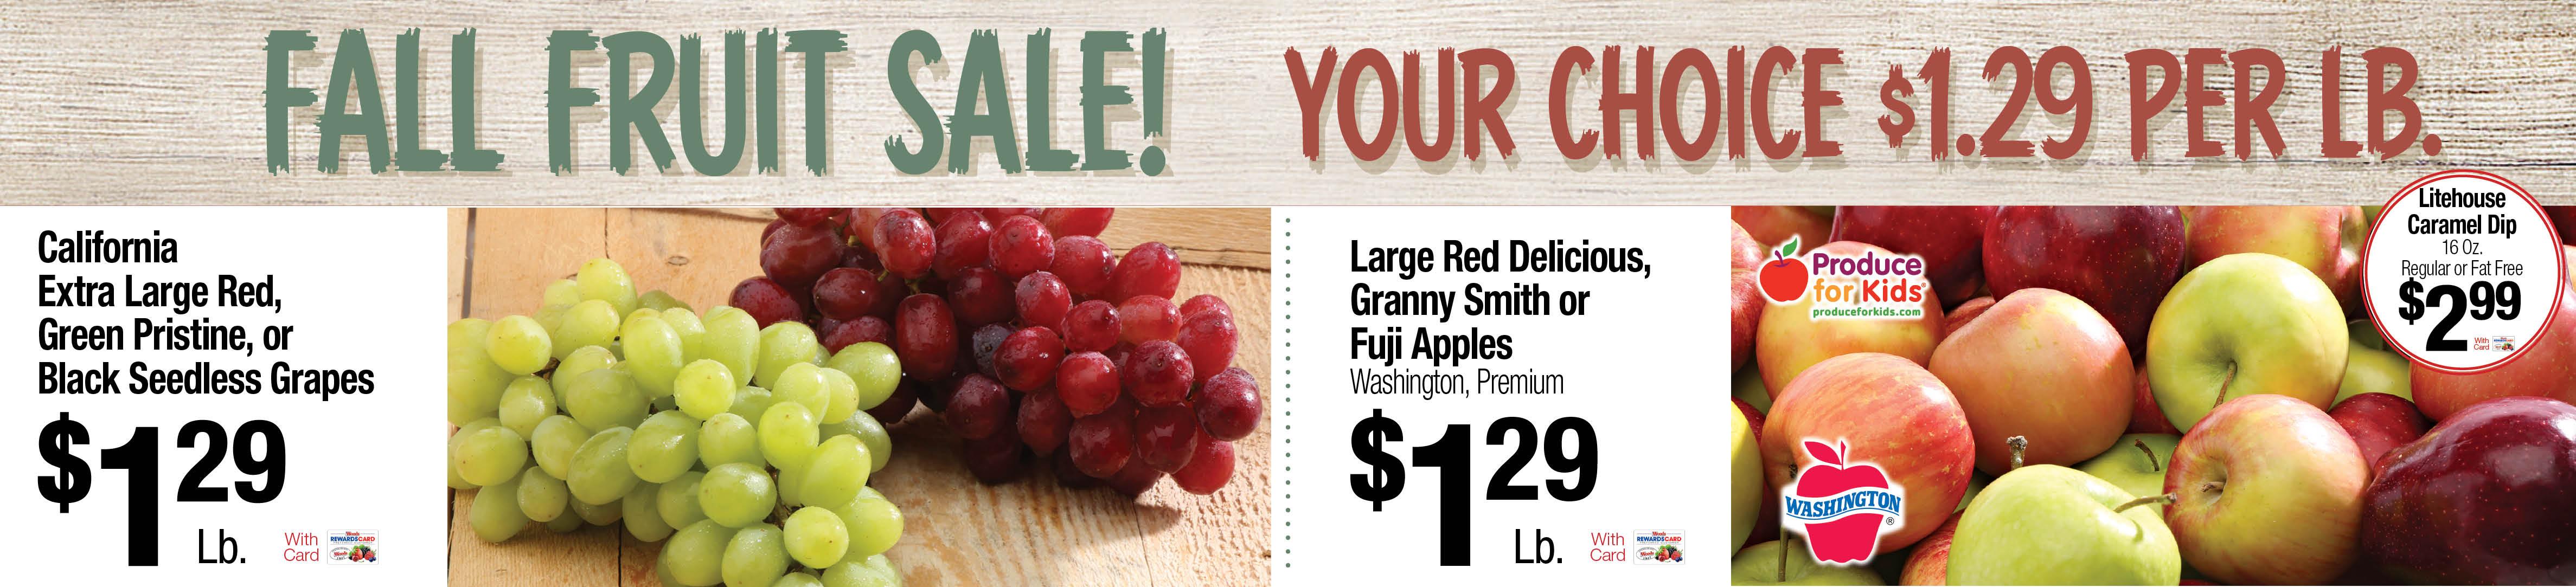 Fall Fruit sale